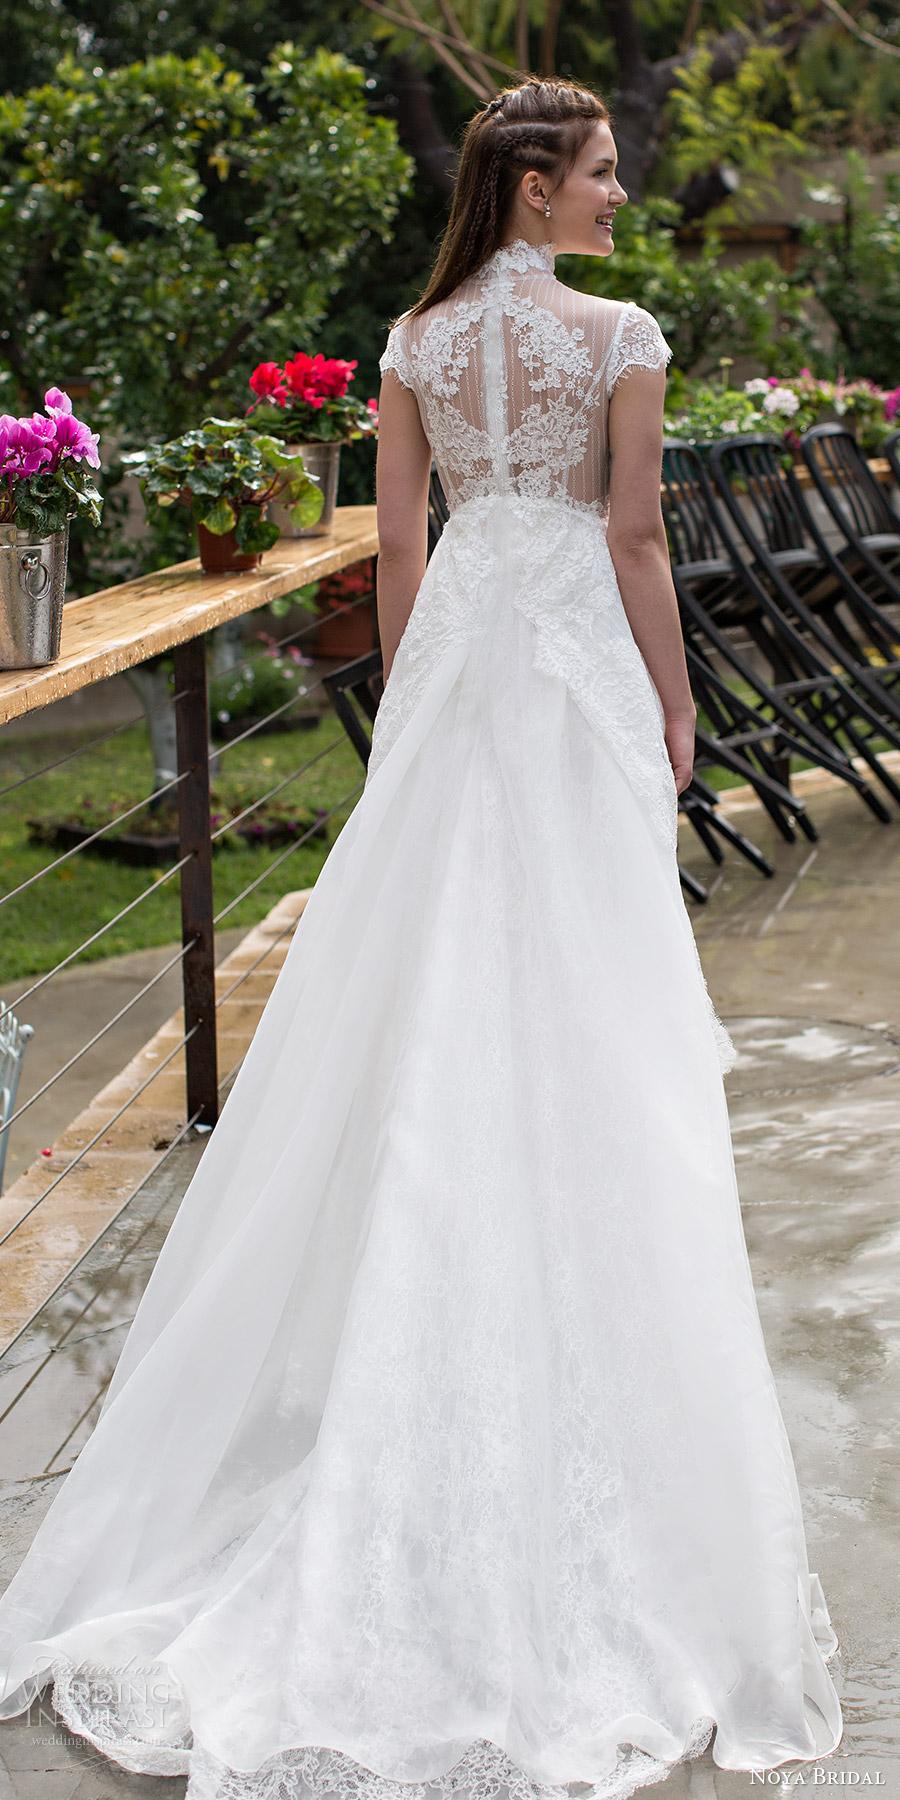 noya bridal 2016 cap sleeves illusion high neckline aline empire waist wedding dress (1203) bv sheer back romantic